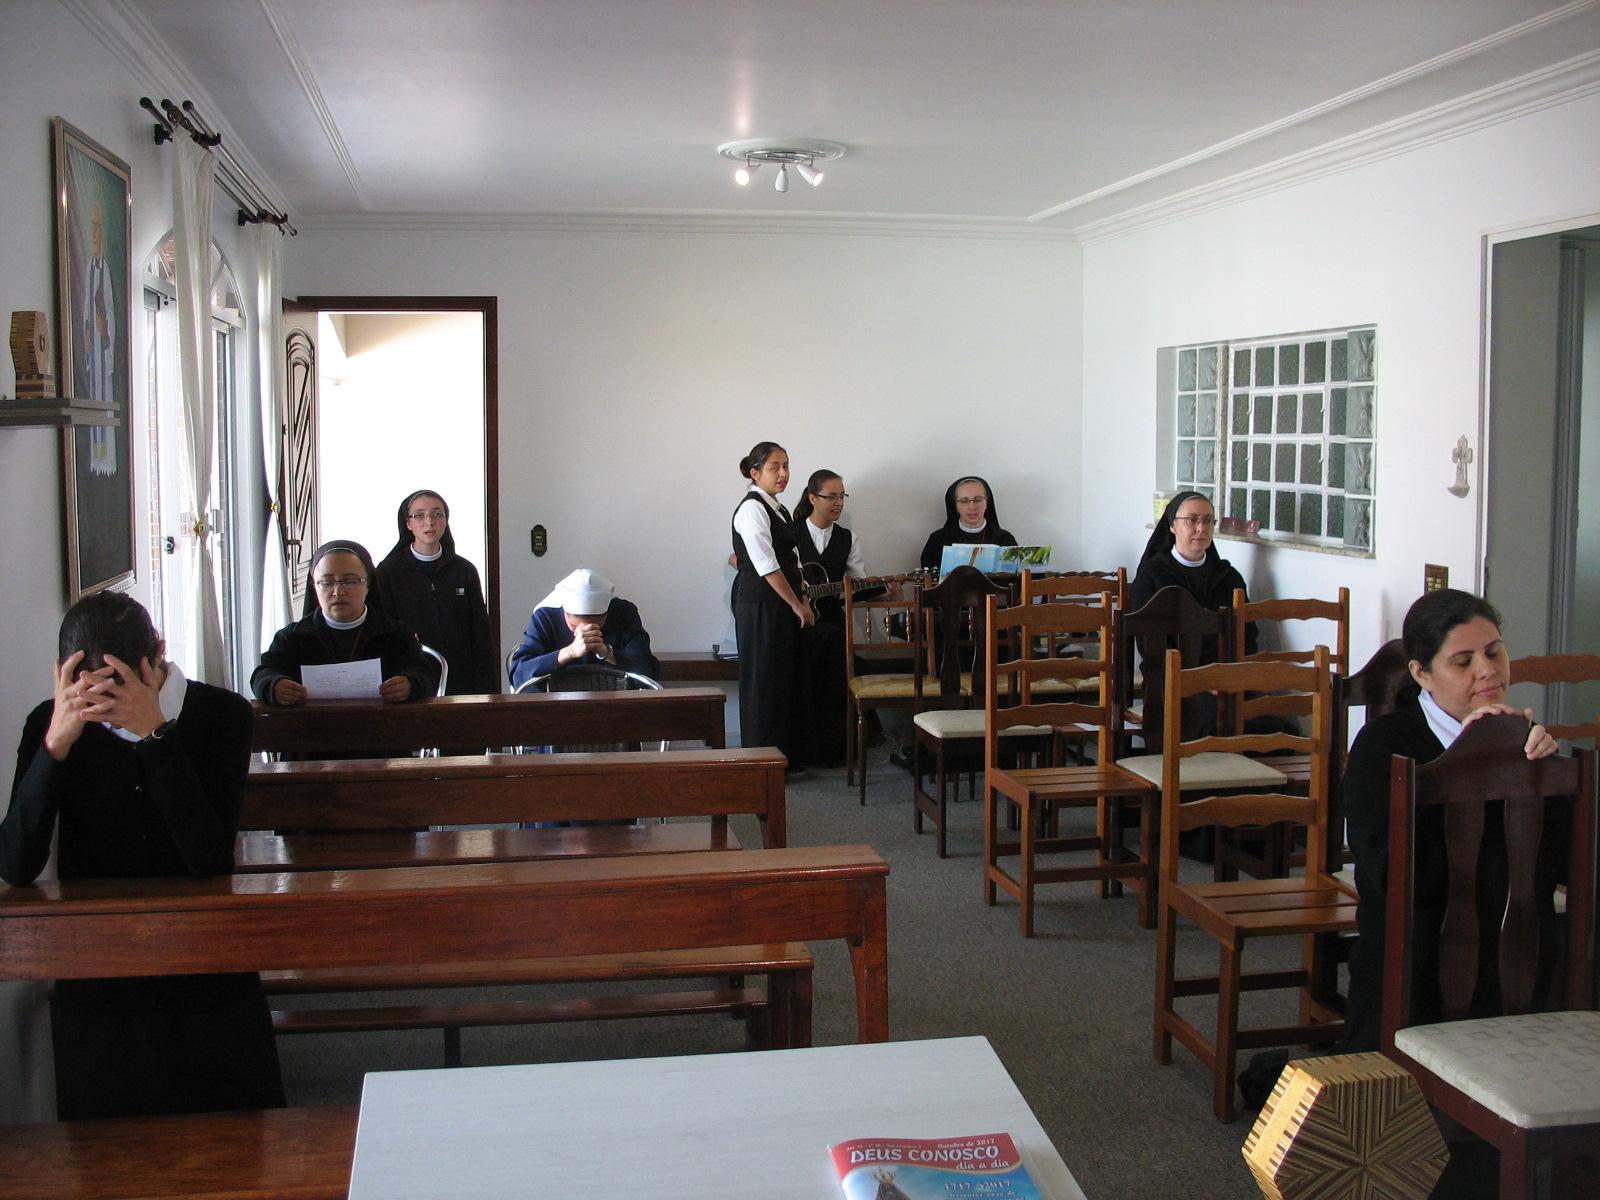 Fotos da missa da festa de Faustina 05-10 026